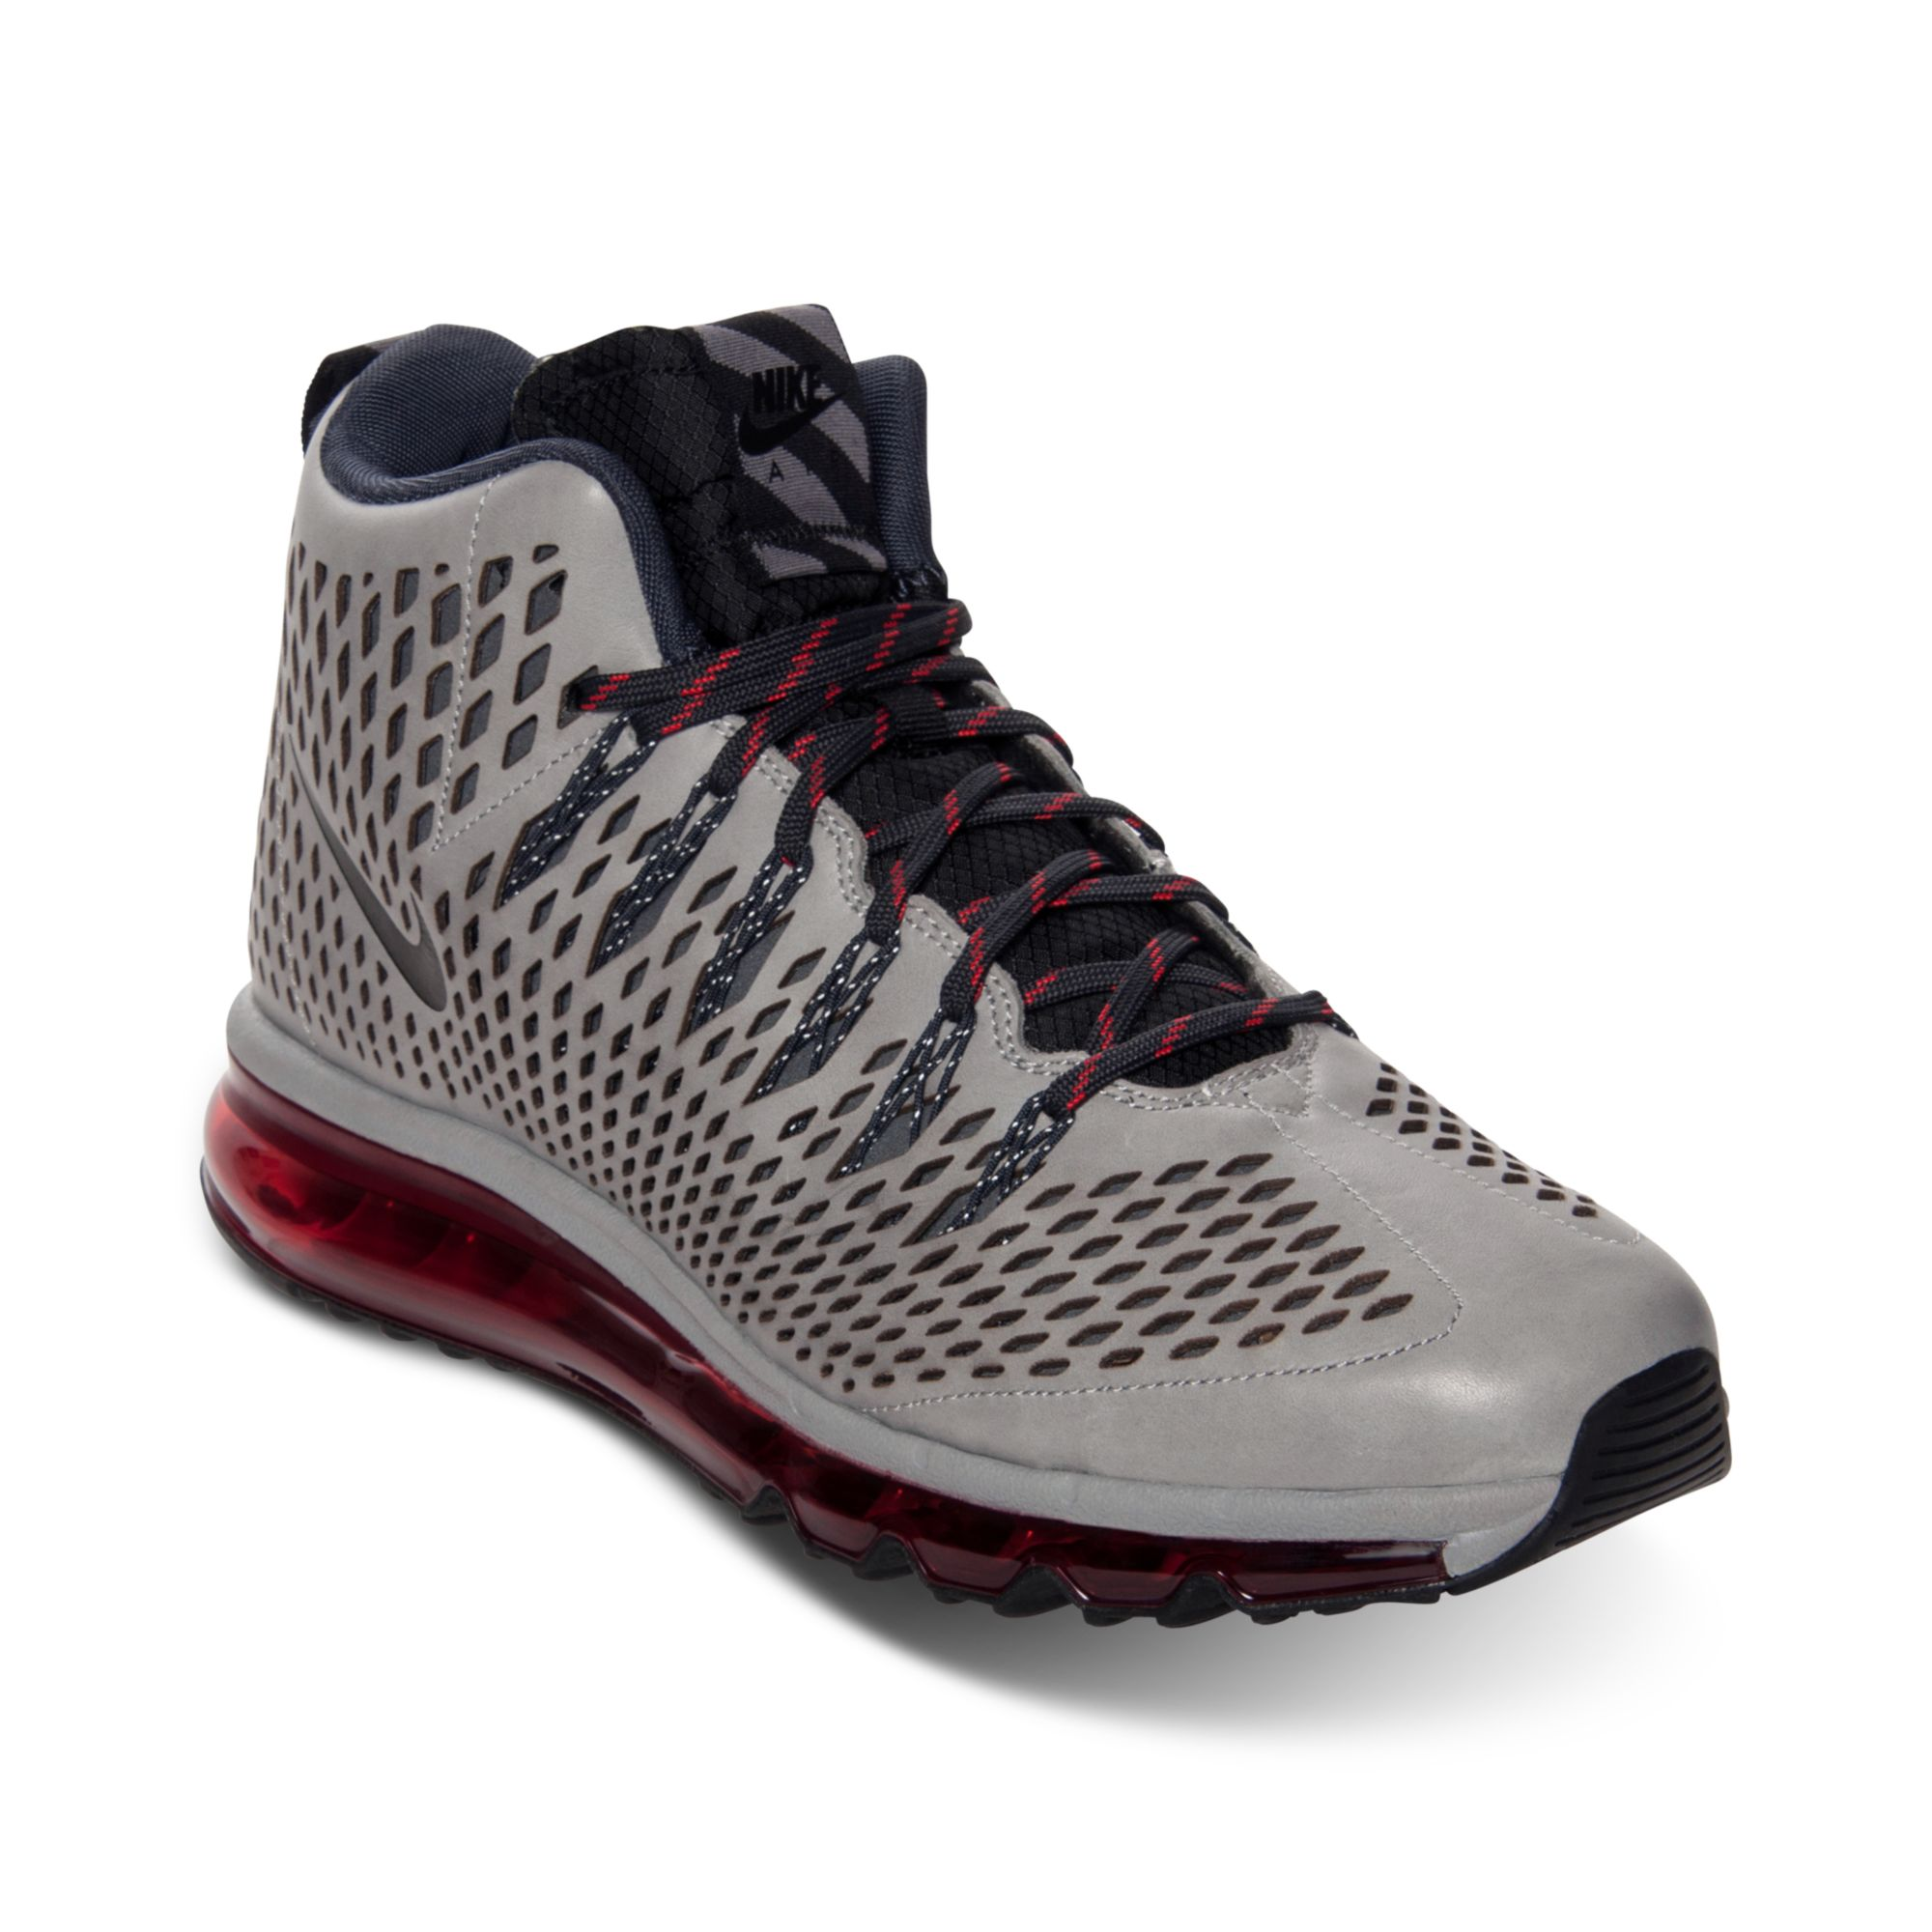 separation shoes 3c1cd 47aa8 mens nike air max graviton casual shoes